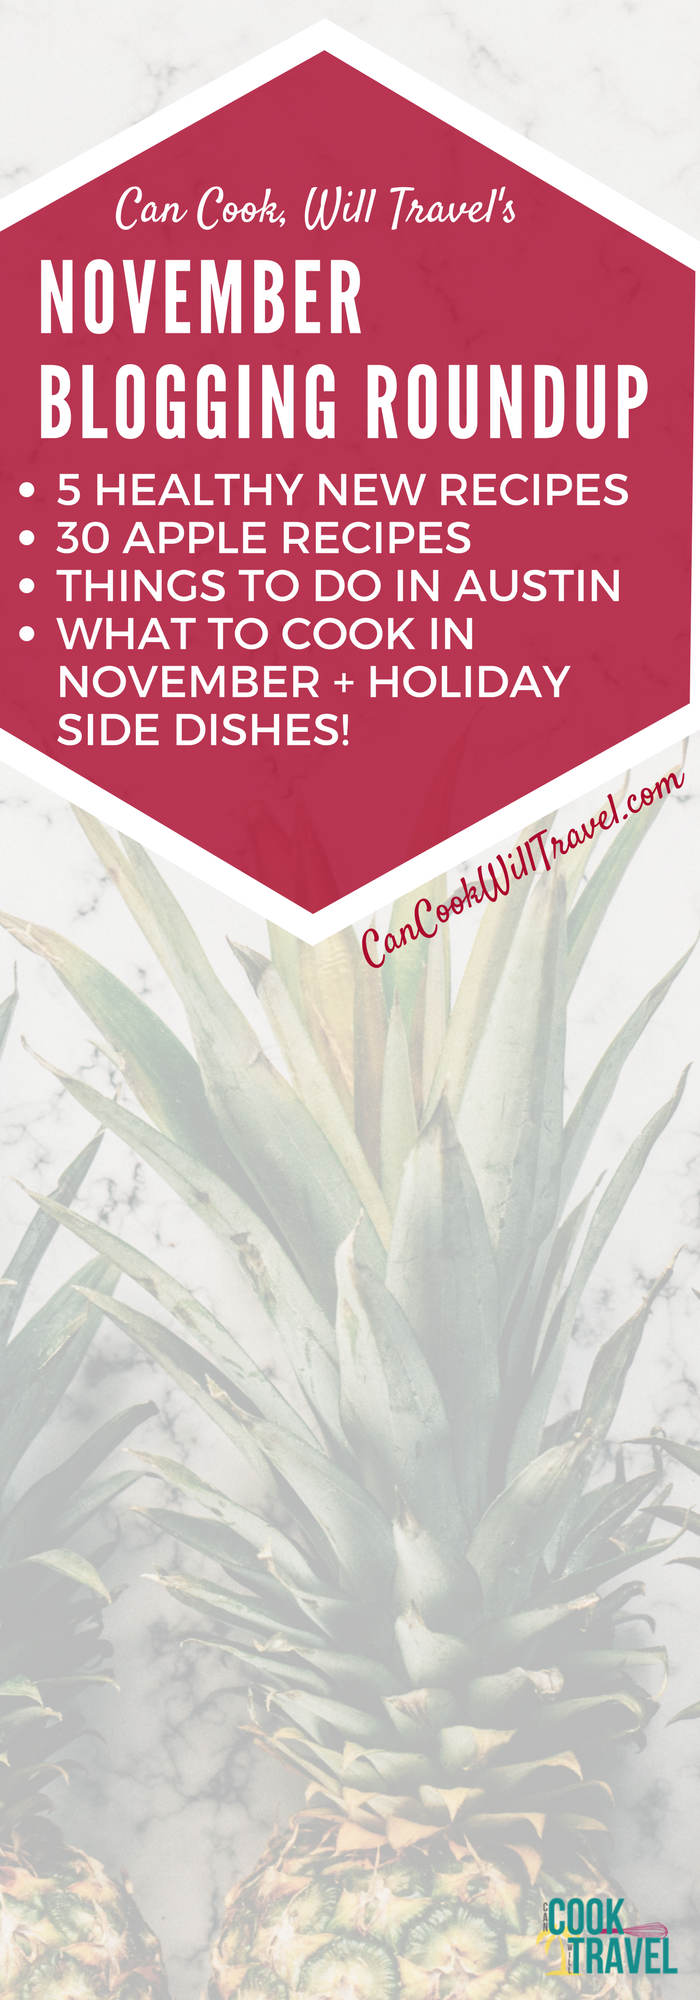 November 2017 Blogging Roundup